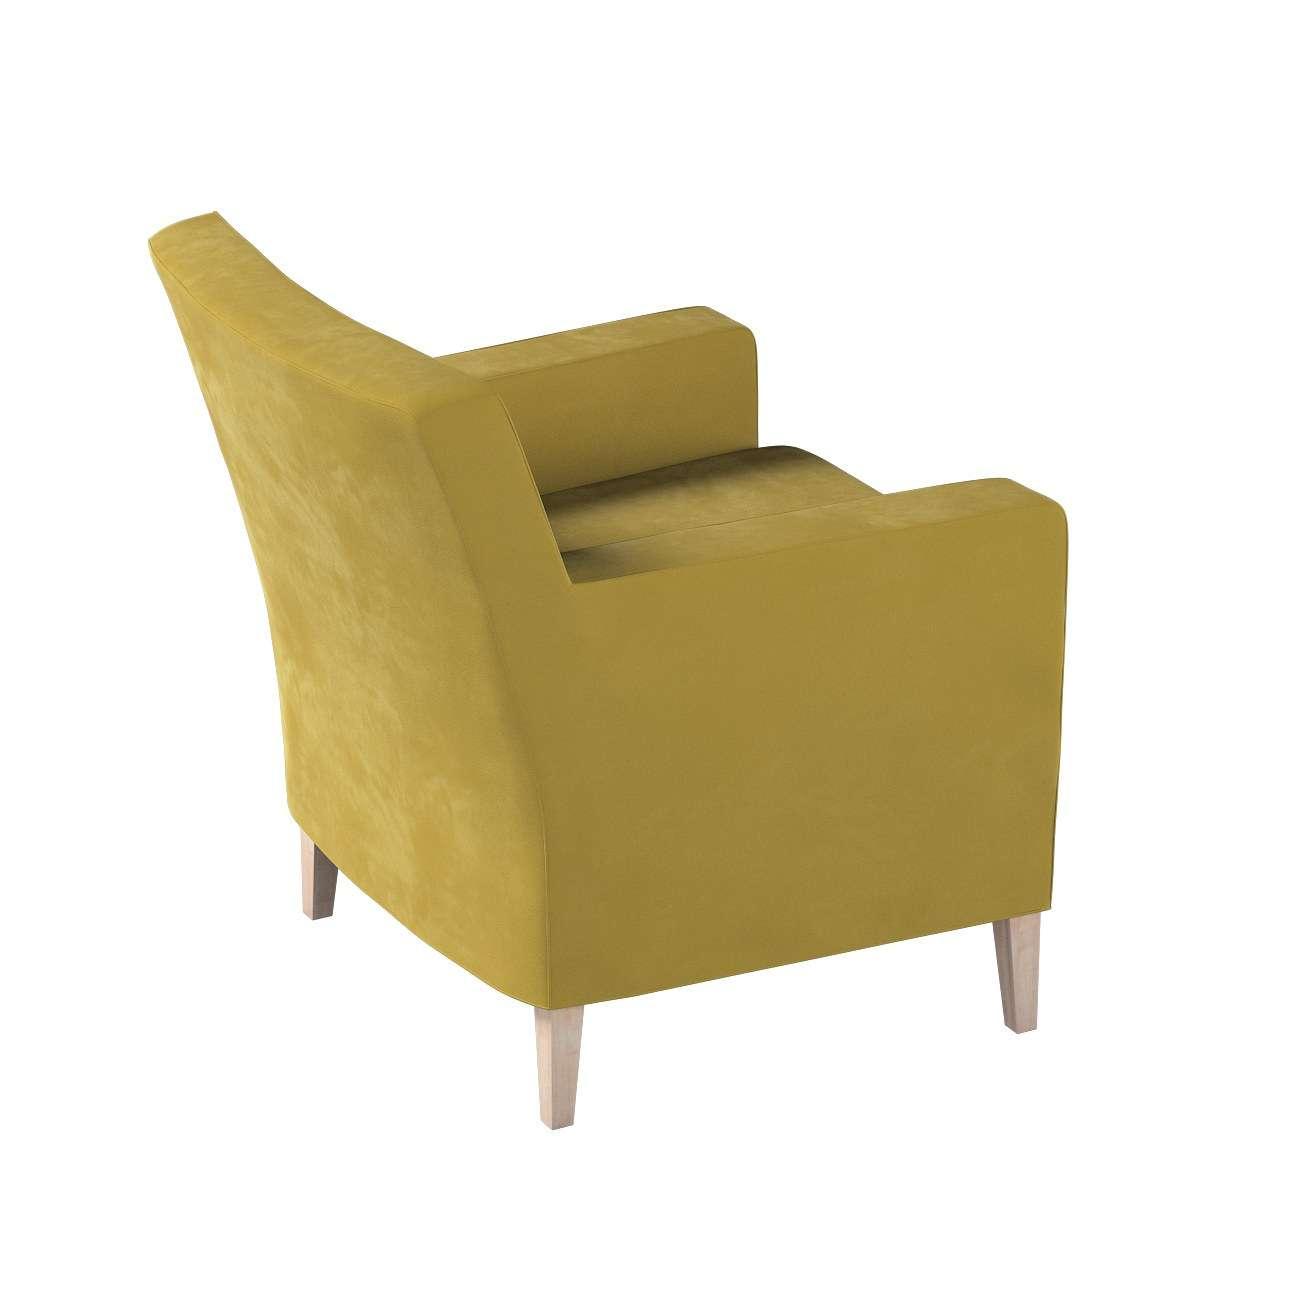 Pokrowiec na fotel Karlstad w kolekcji Velvet, tkanina: 704-27